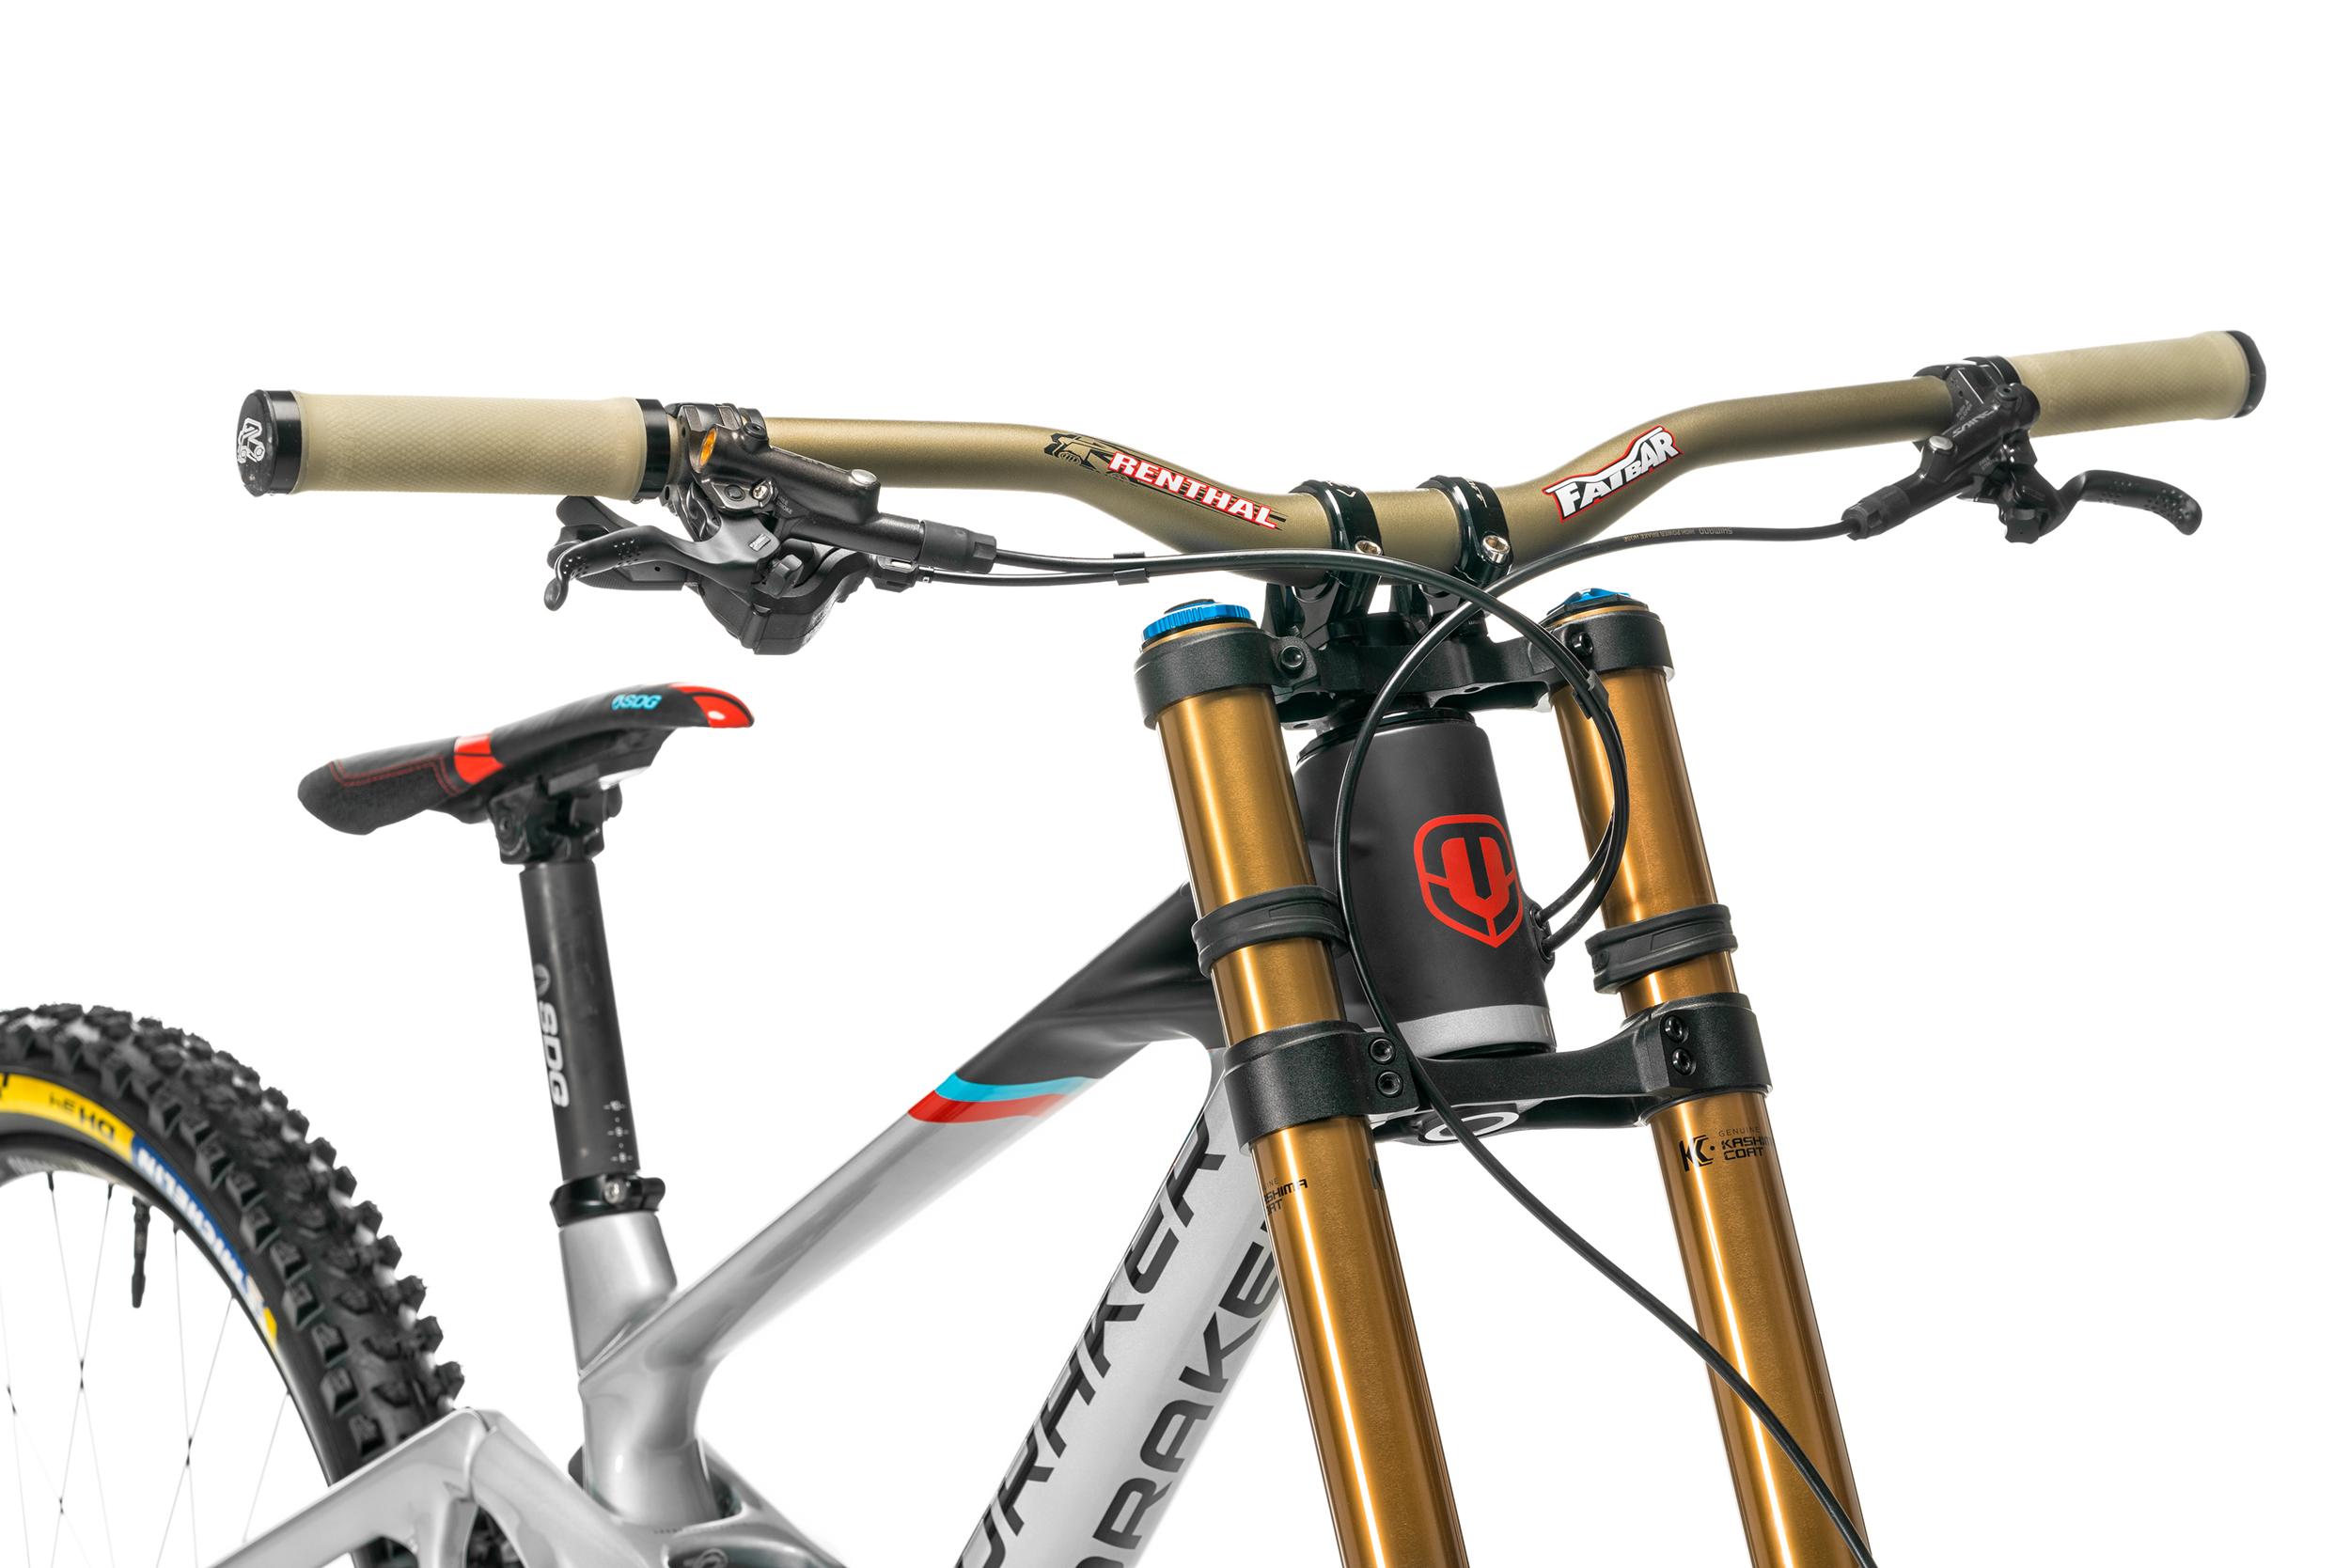 Bar: Fatbar Carbon 35mm Grips: push on/ lock on Stem: integra 35 check out www.renthal.com